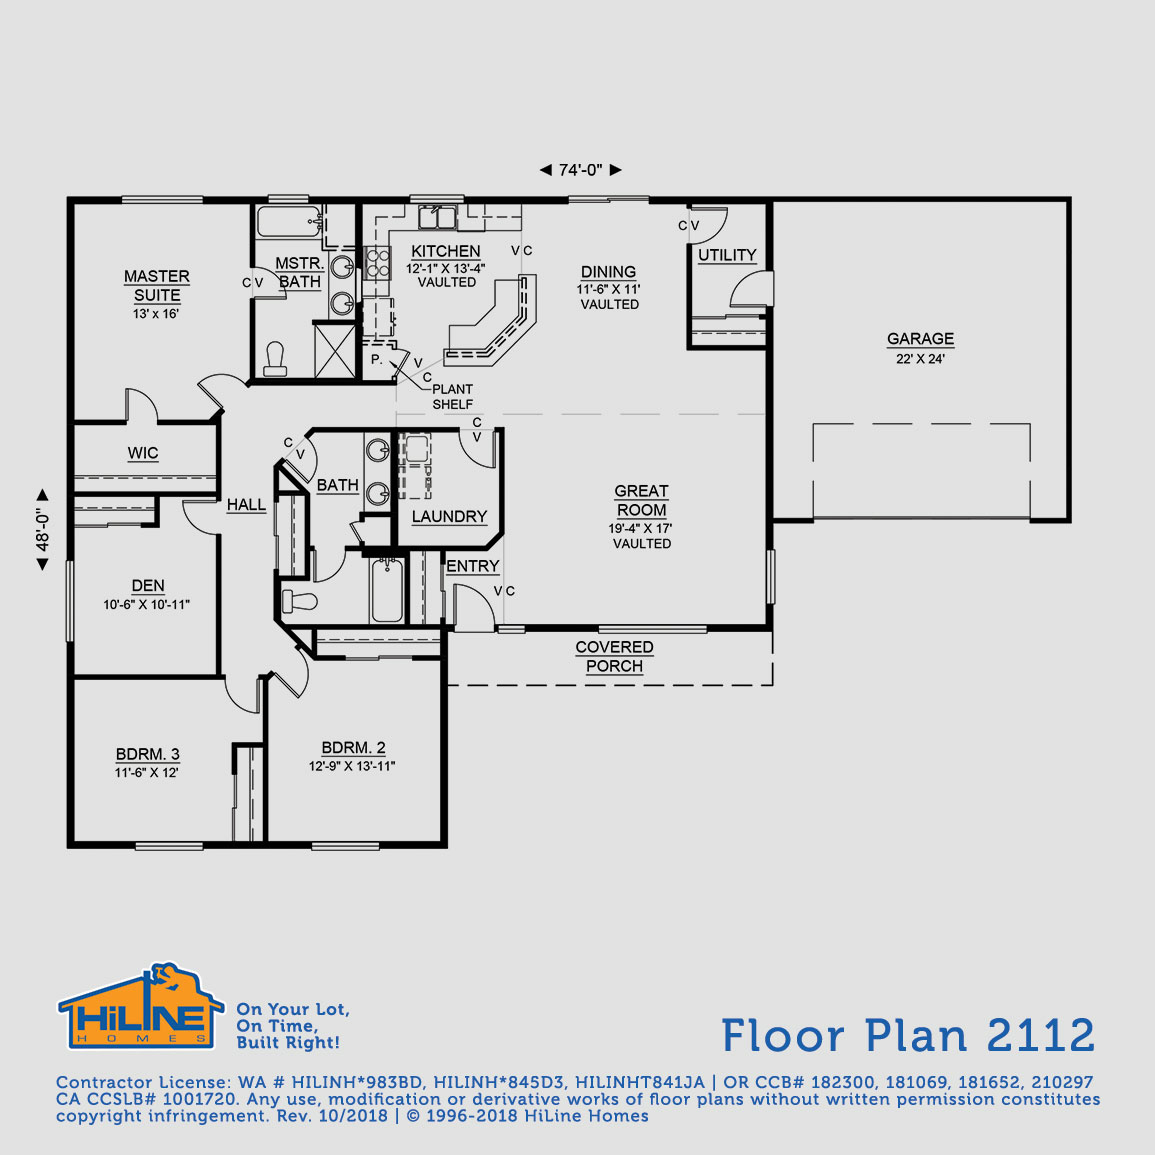 Floorplan 2112